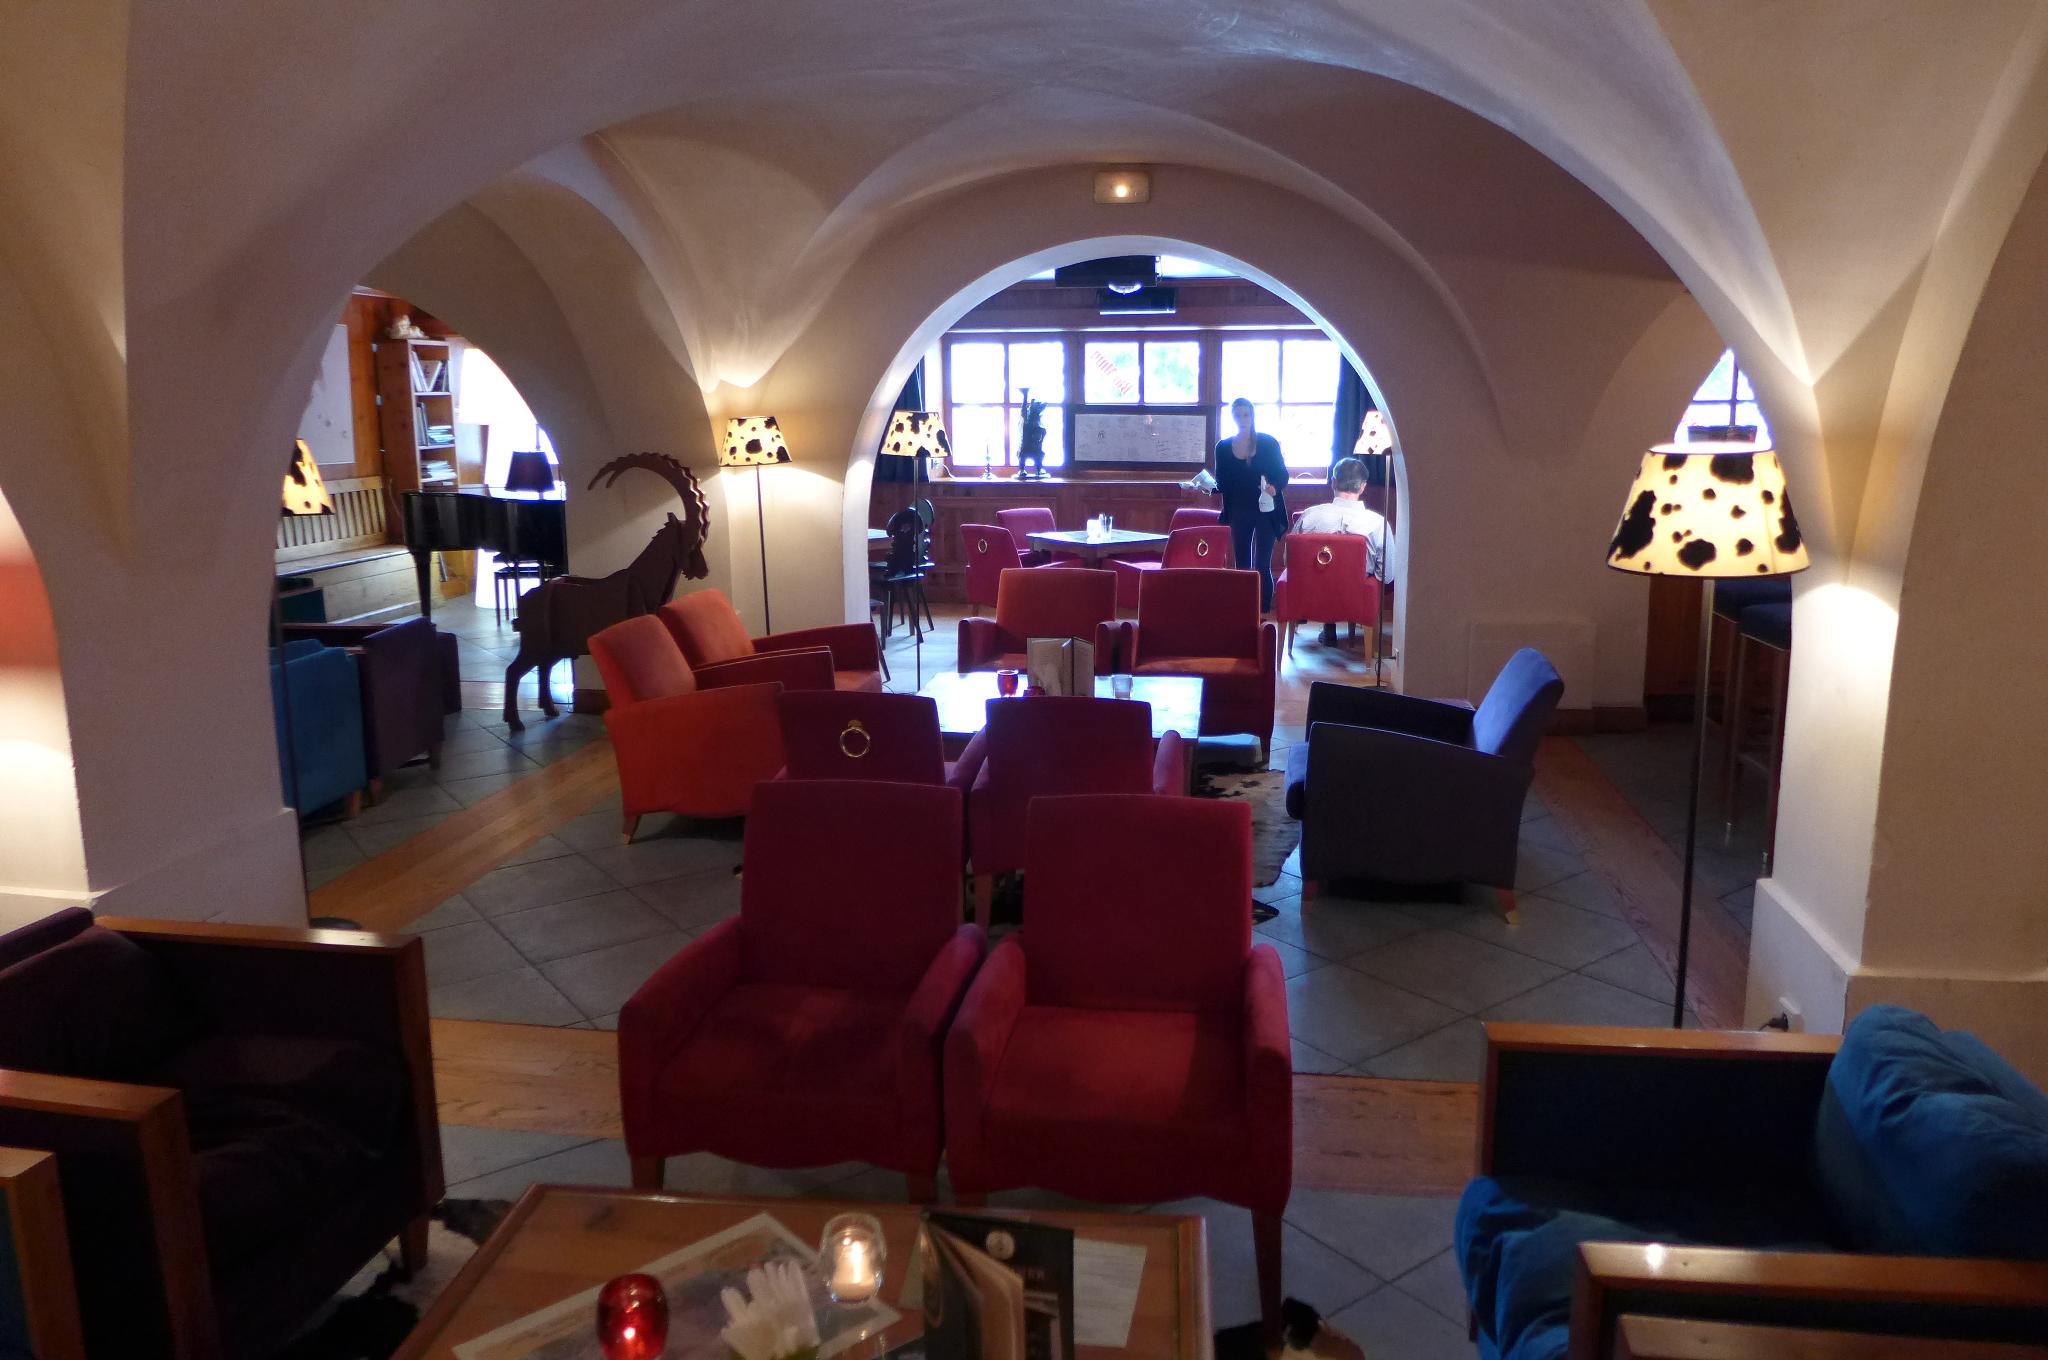 Salle manger - La salle a manger salon de provence restaurant ...